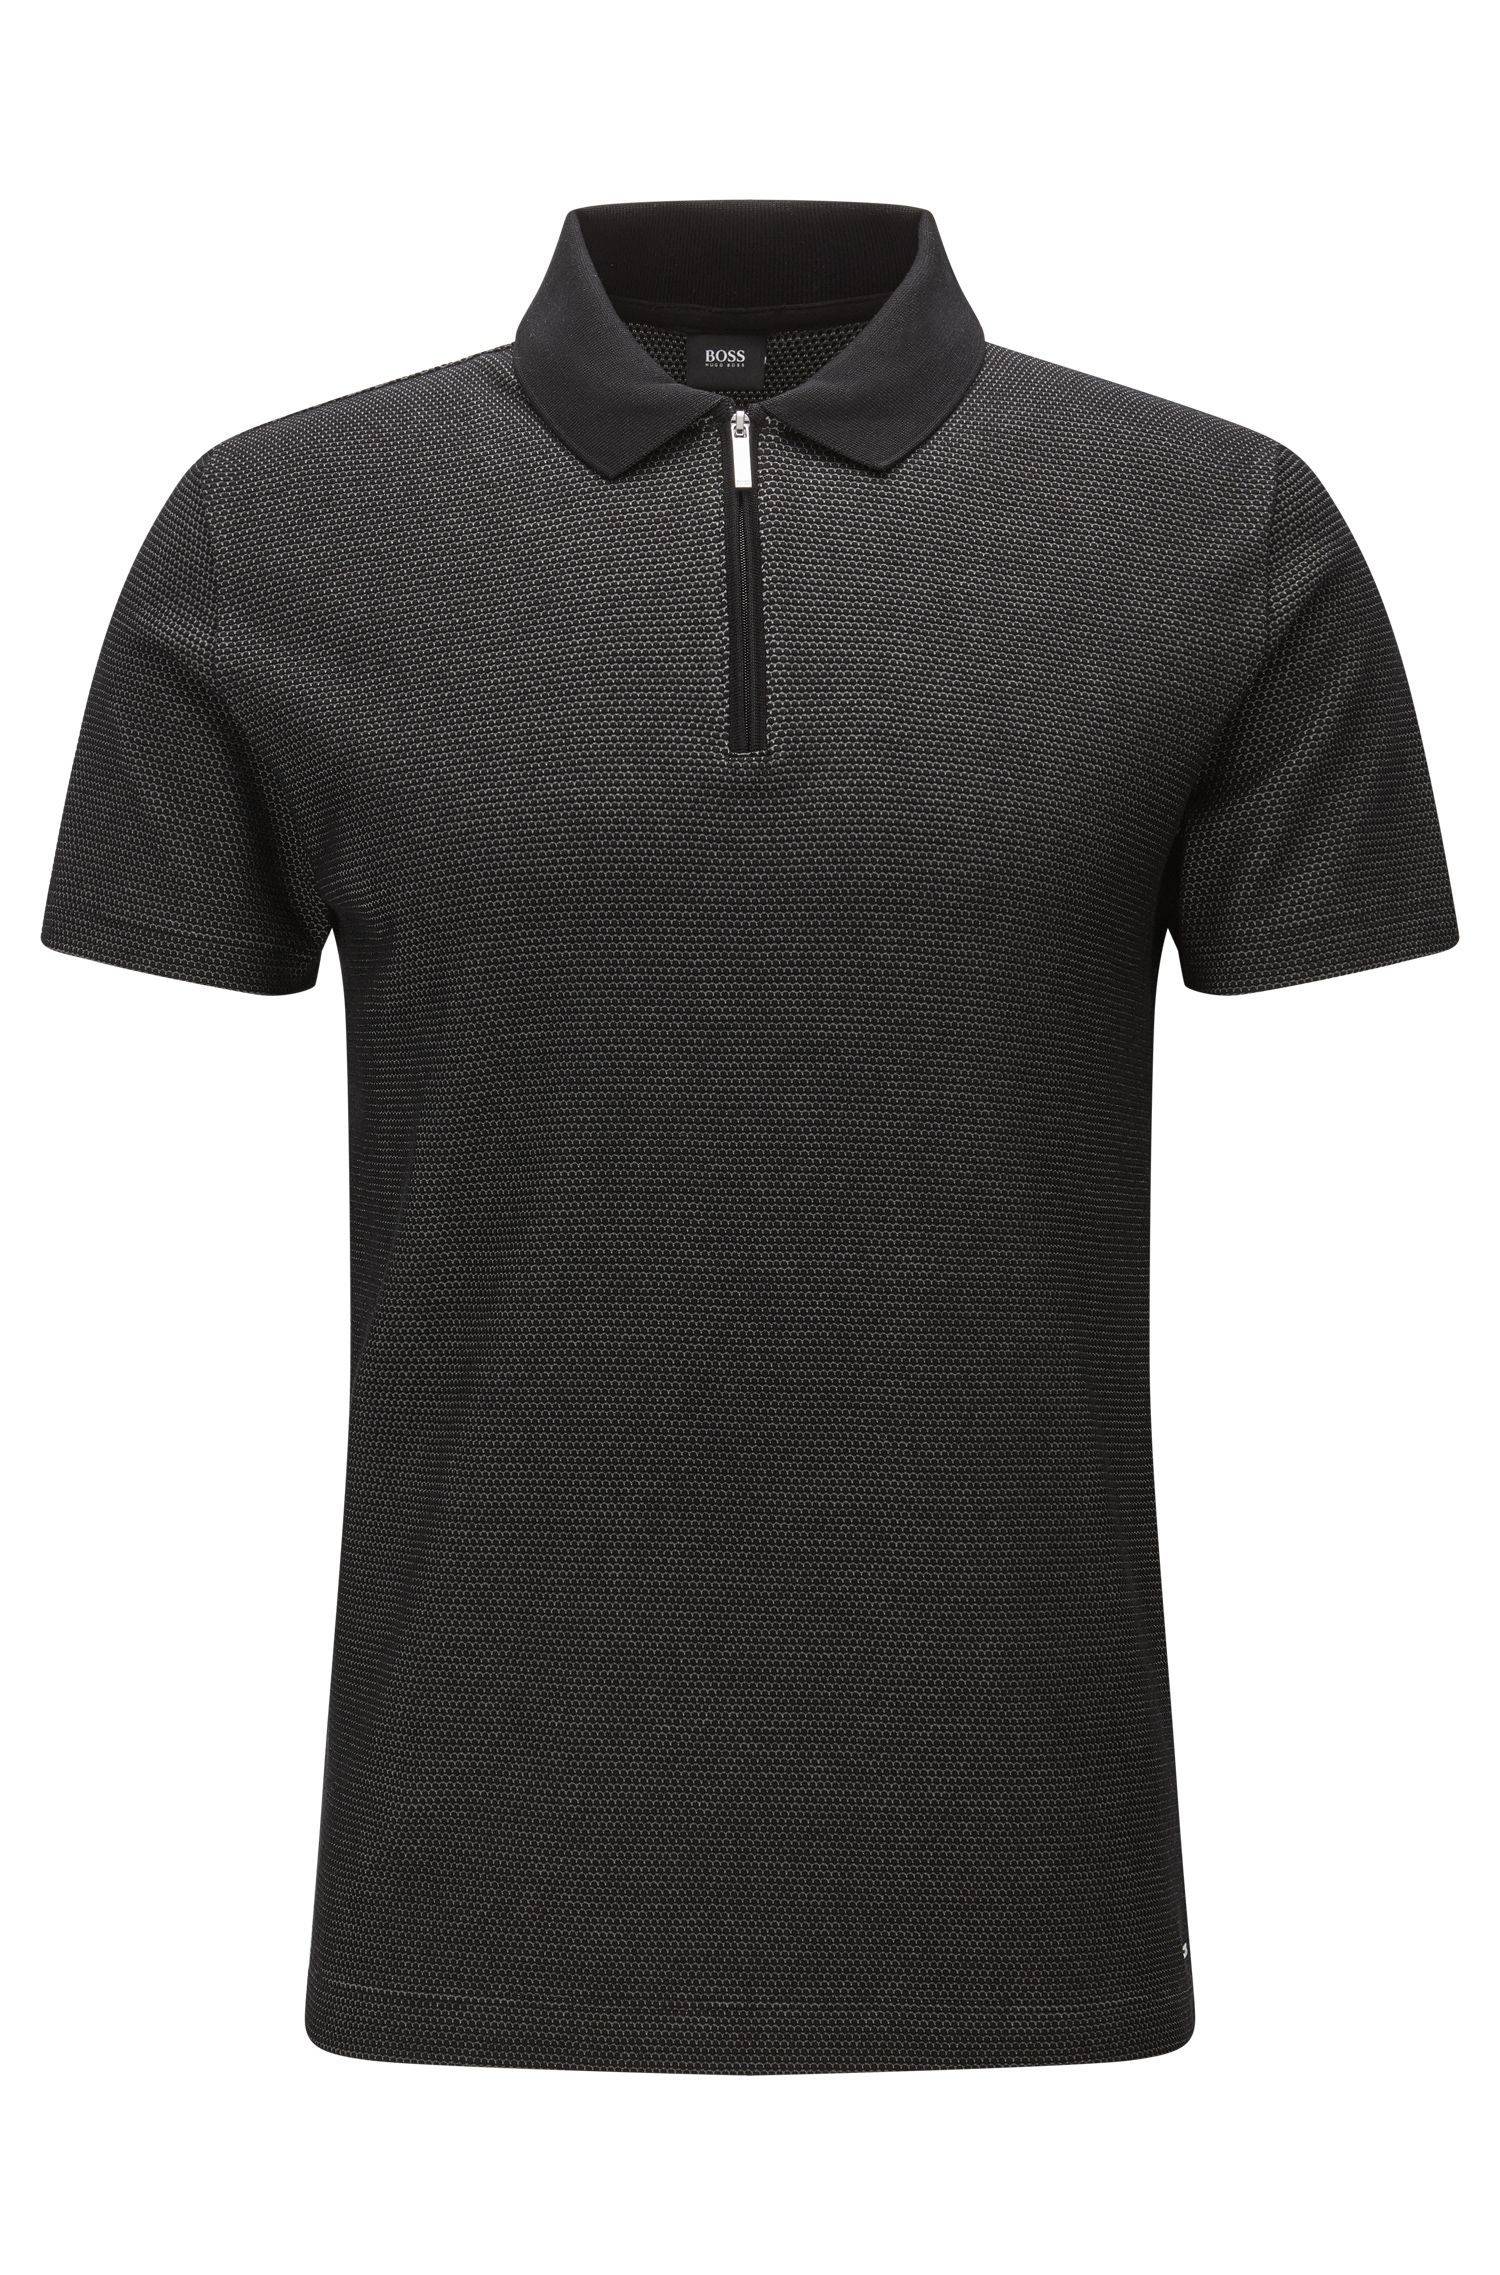 Patterned Mercerized Pima Cotton Polo Shirt, Slim Fit | Polston